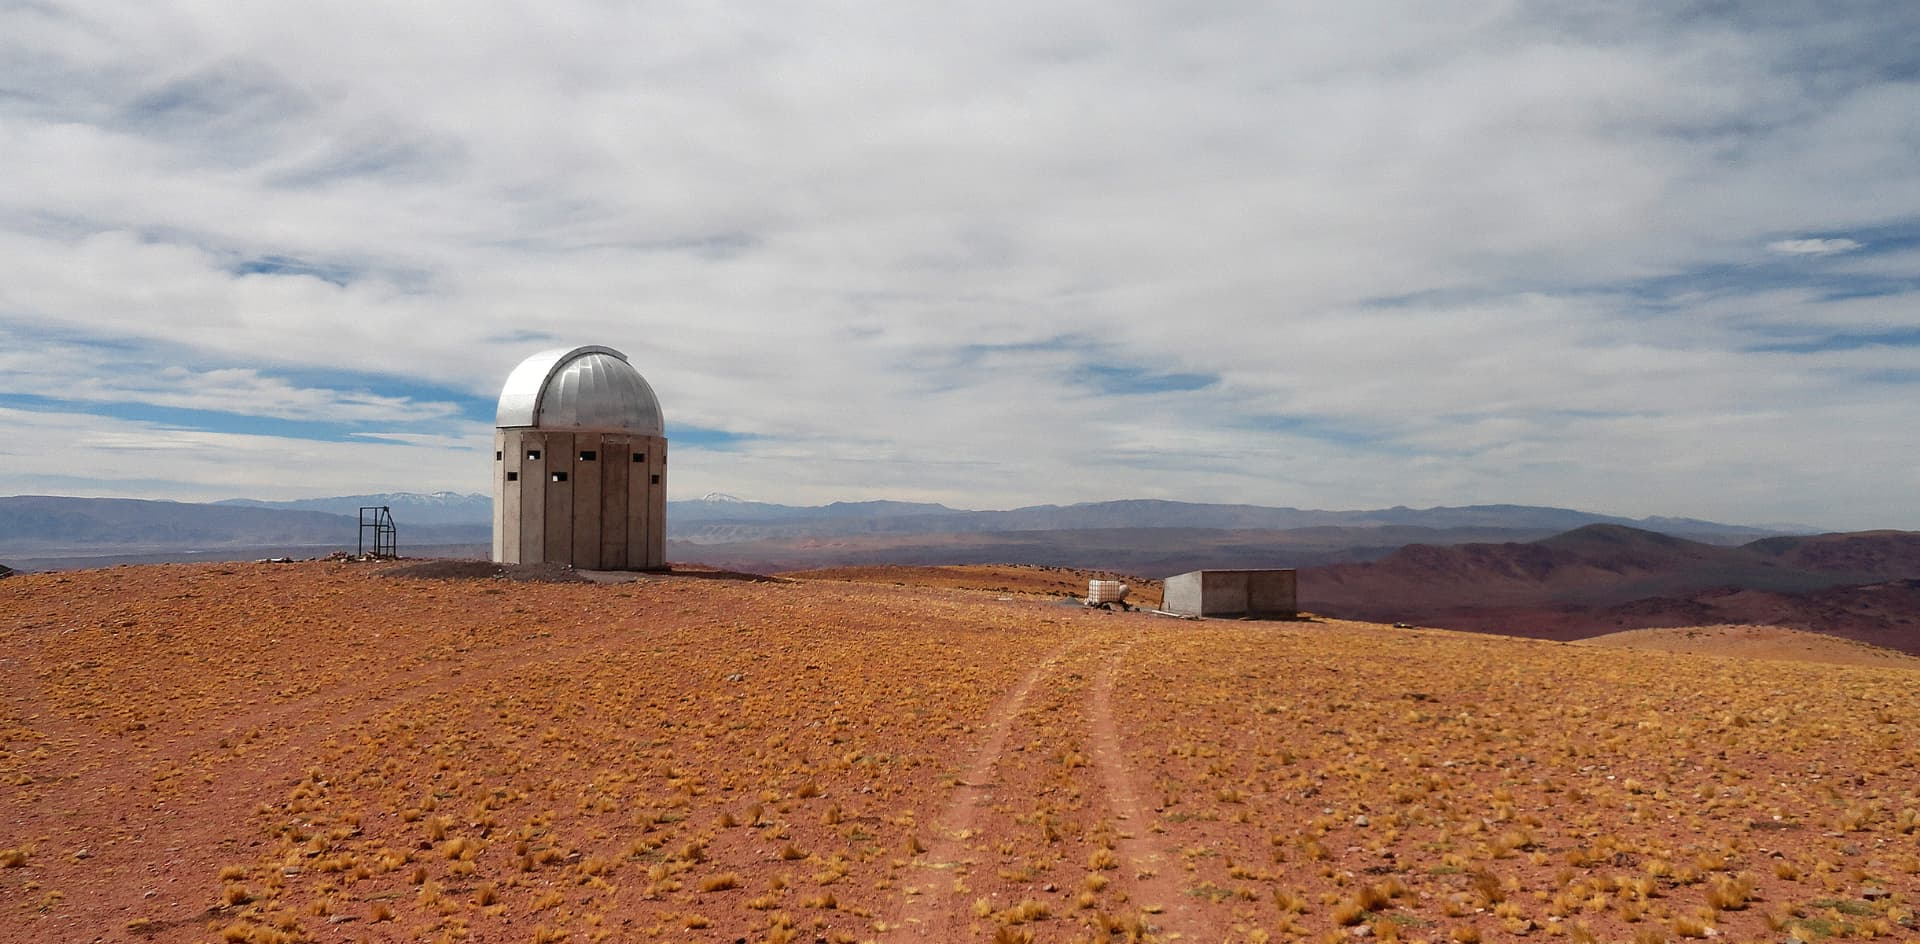 Instalarán un telescopio robótico en Salta